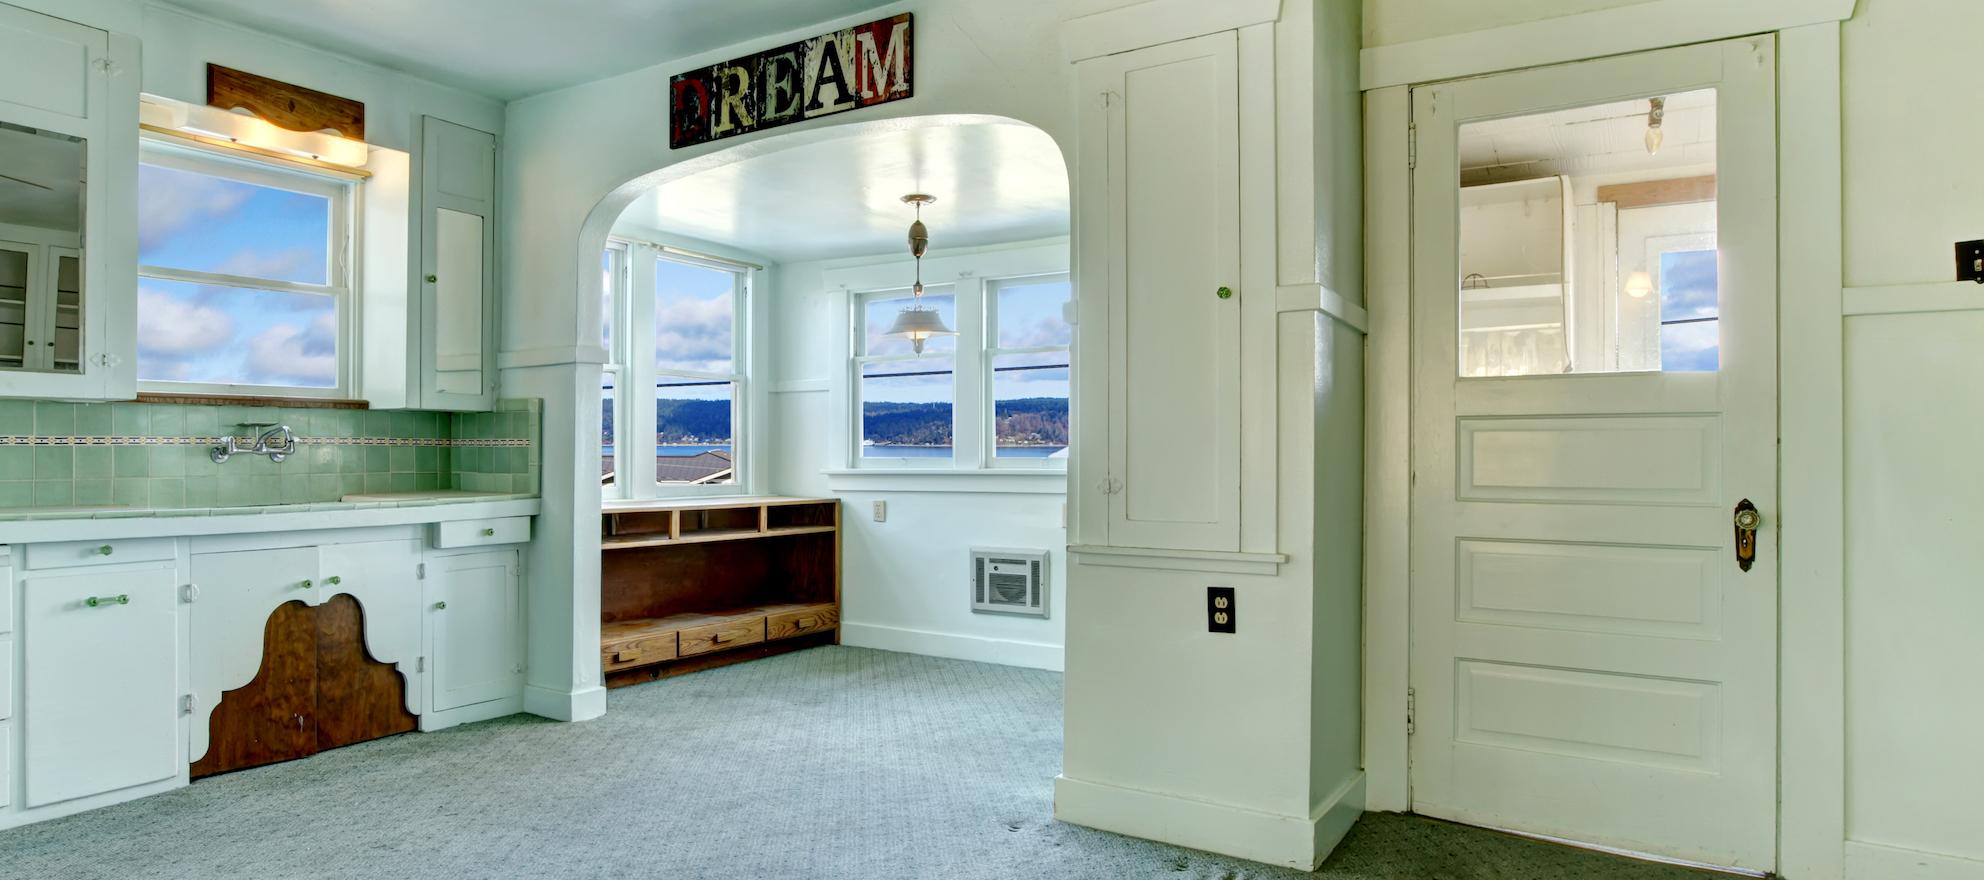 fixer upper, dream home